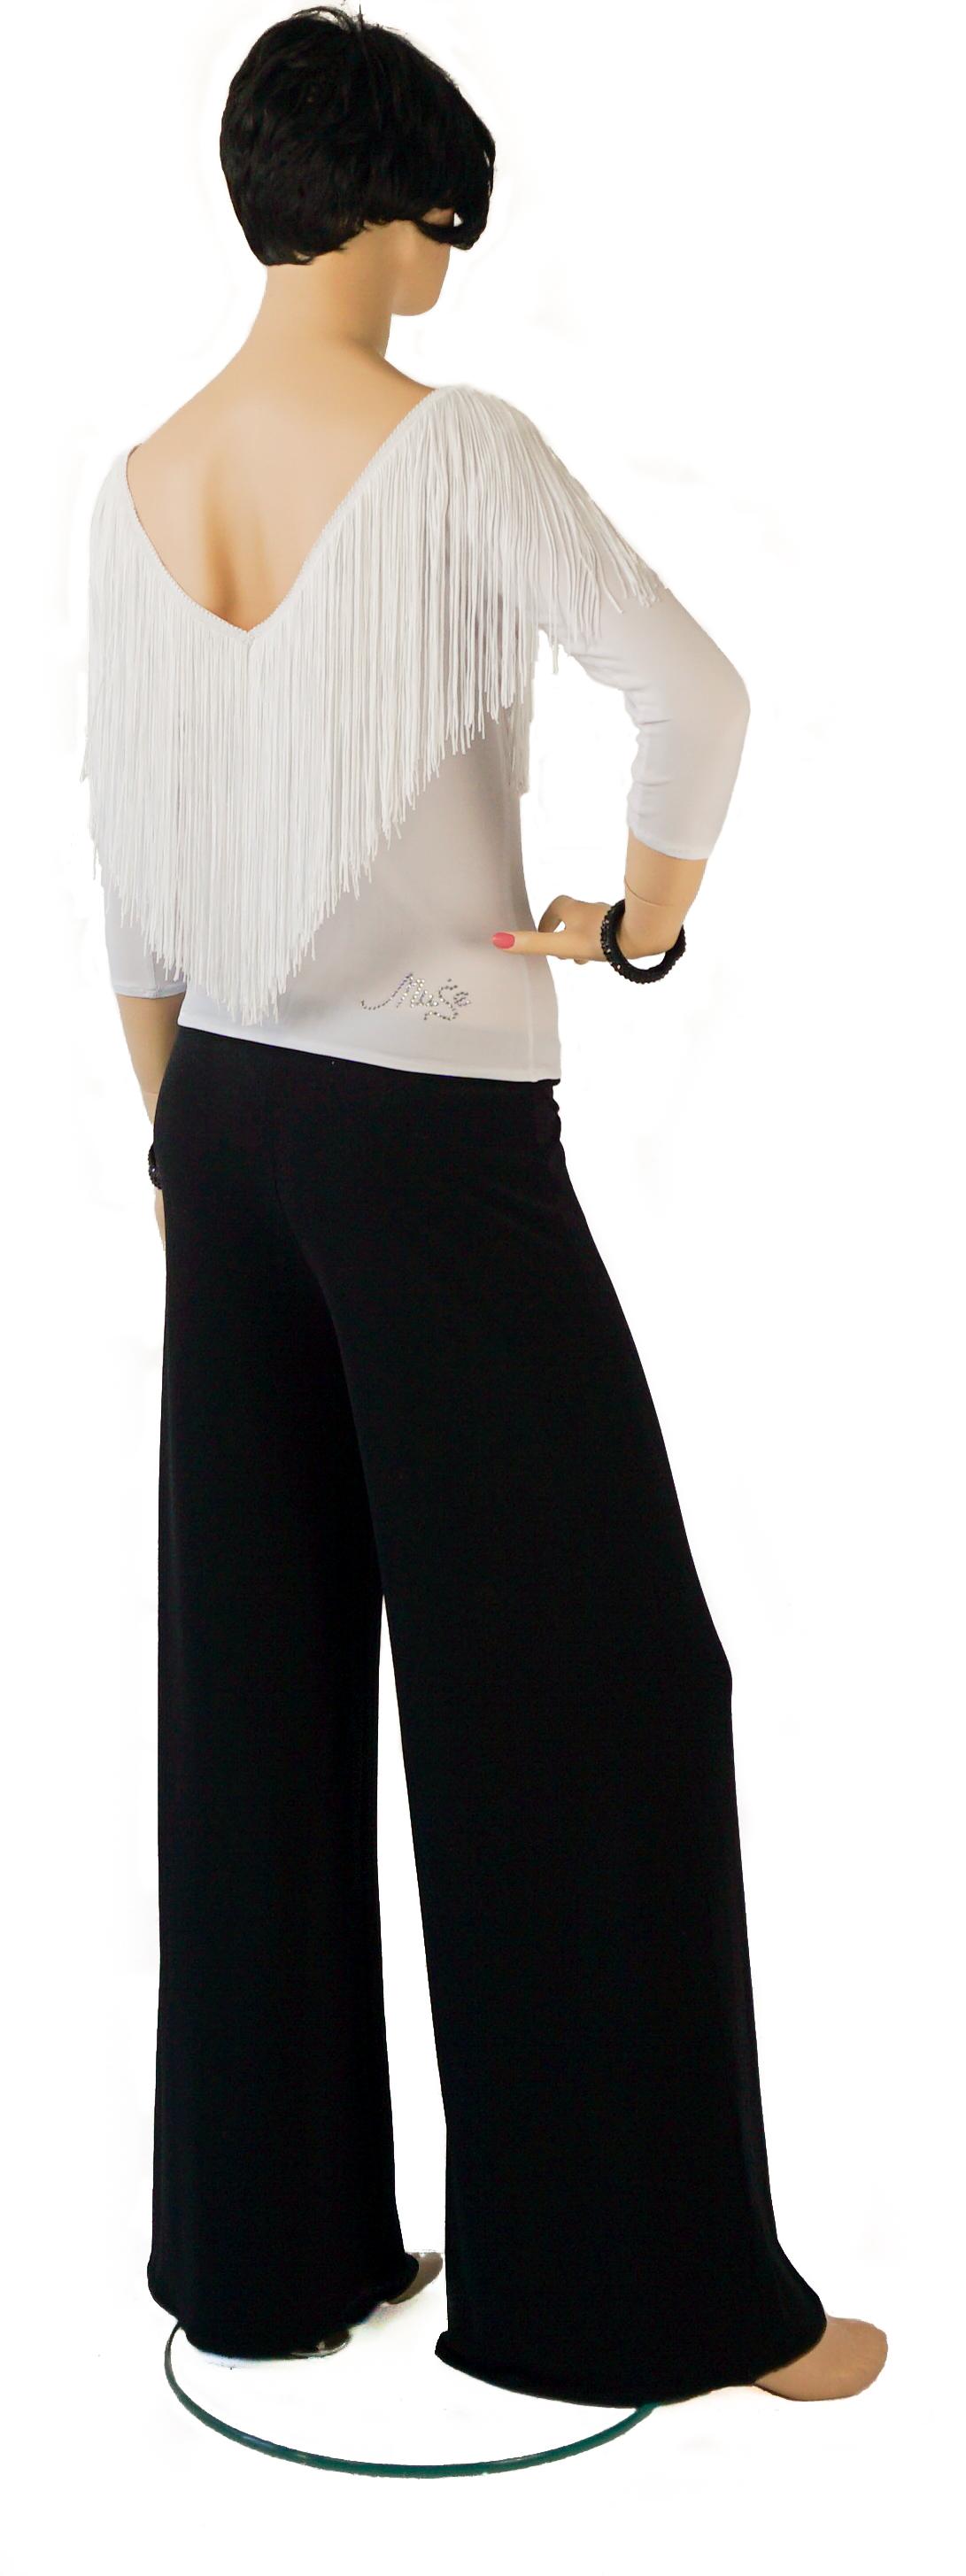 Top-$150 Pants-$110